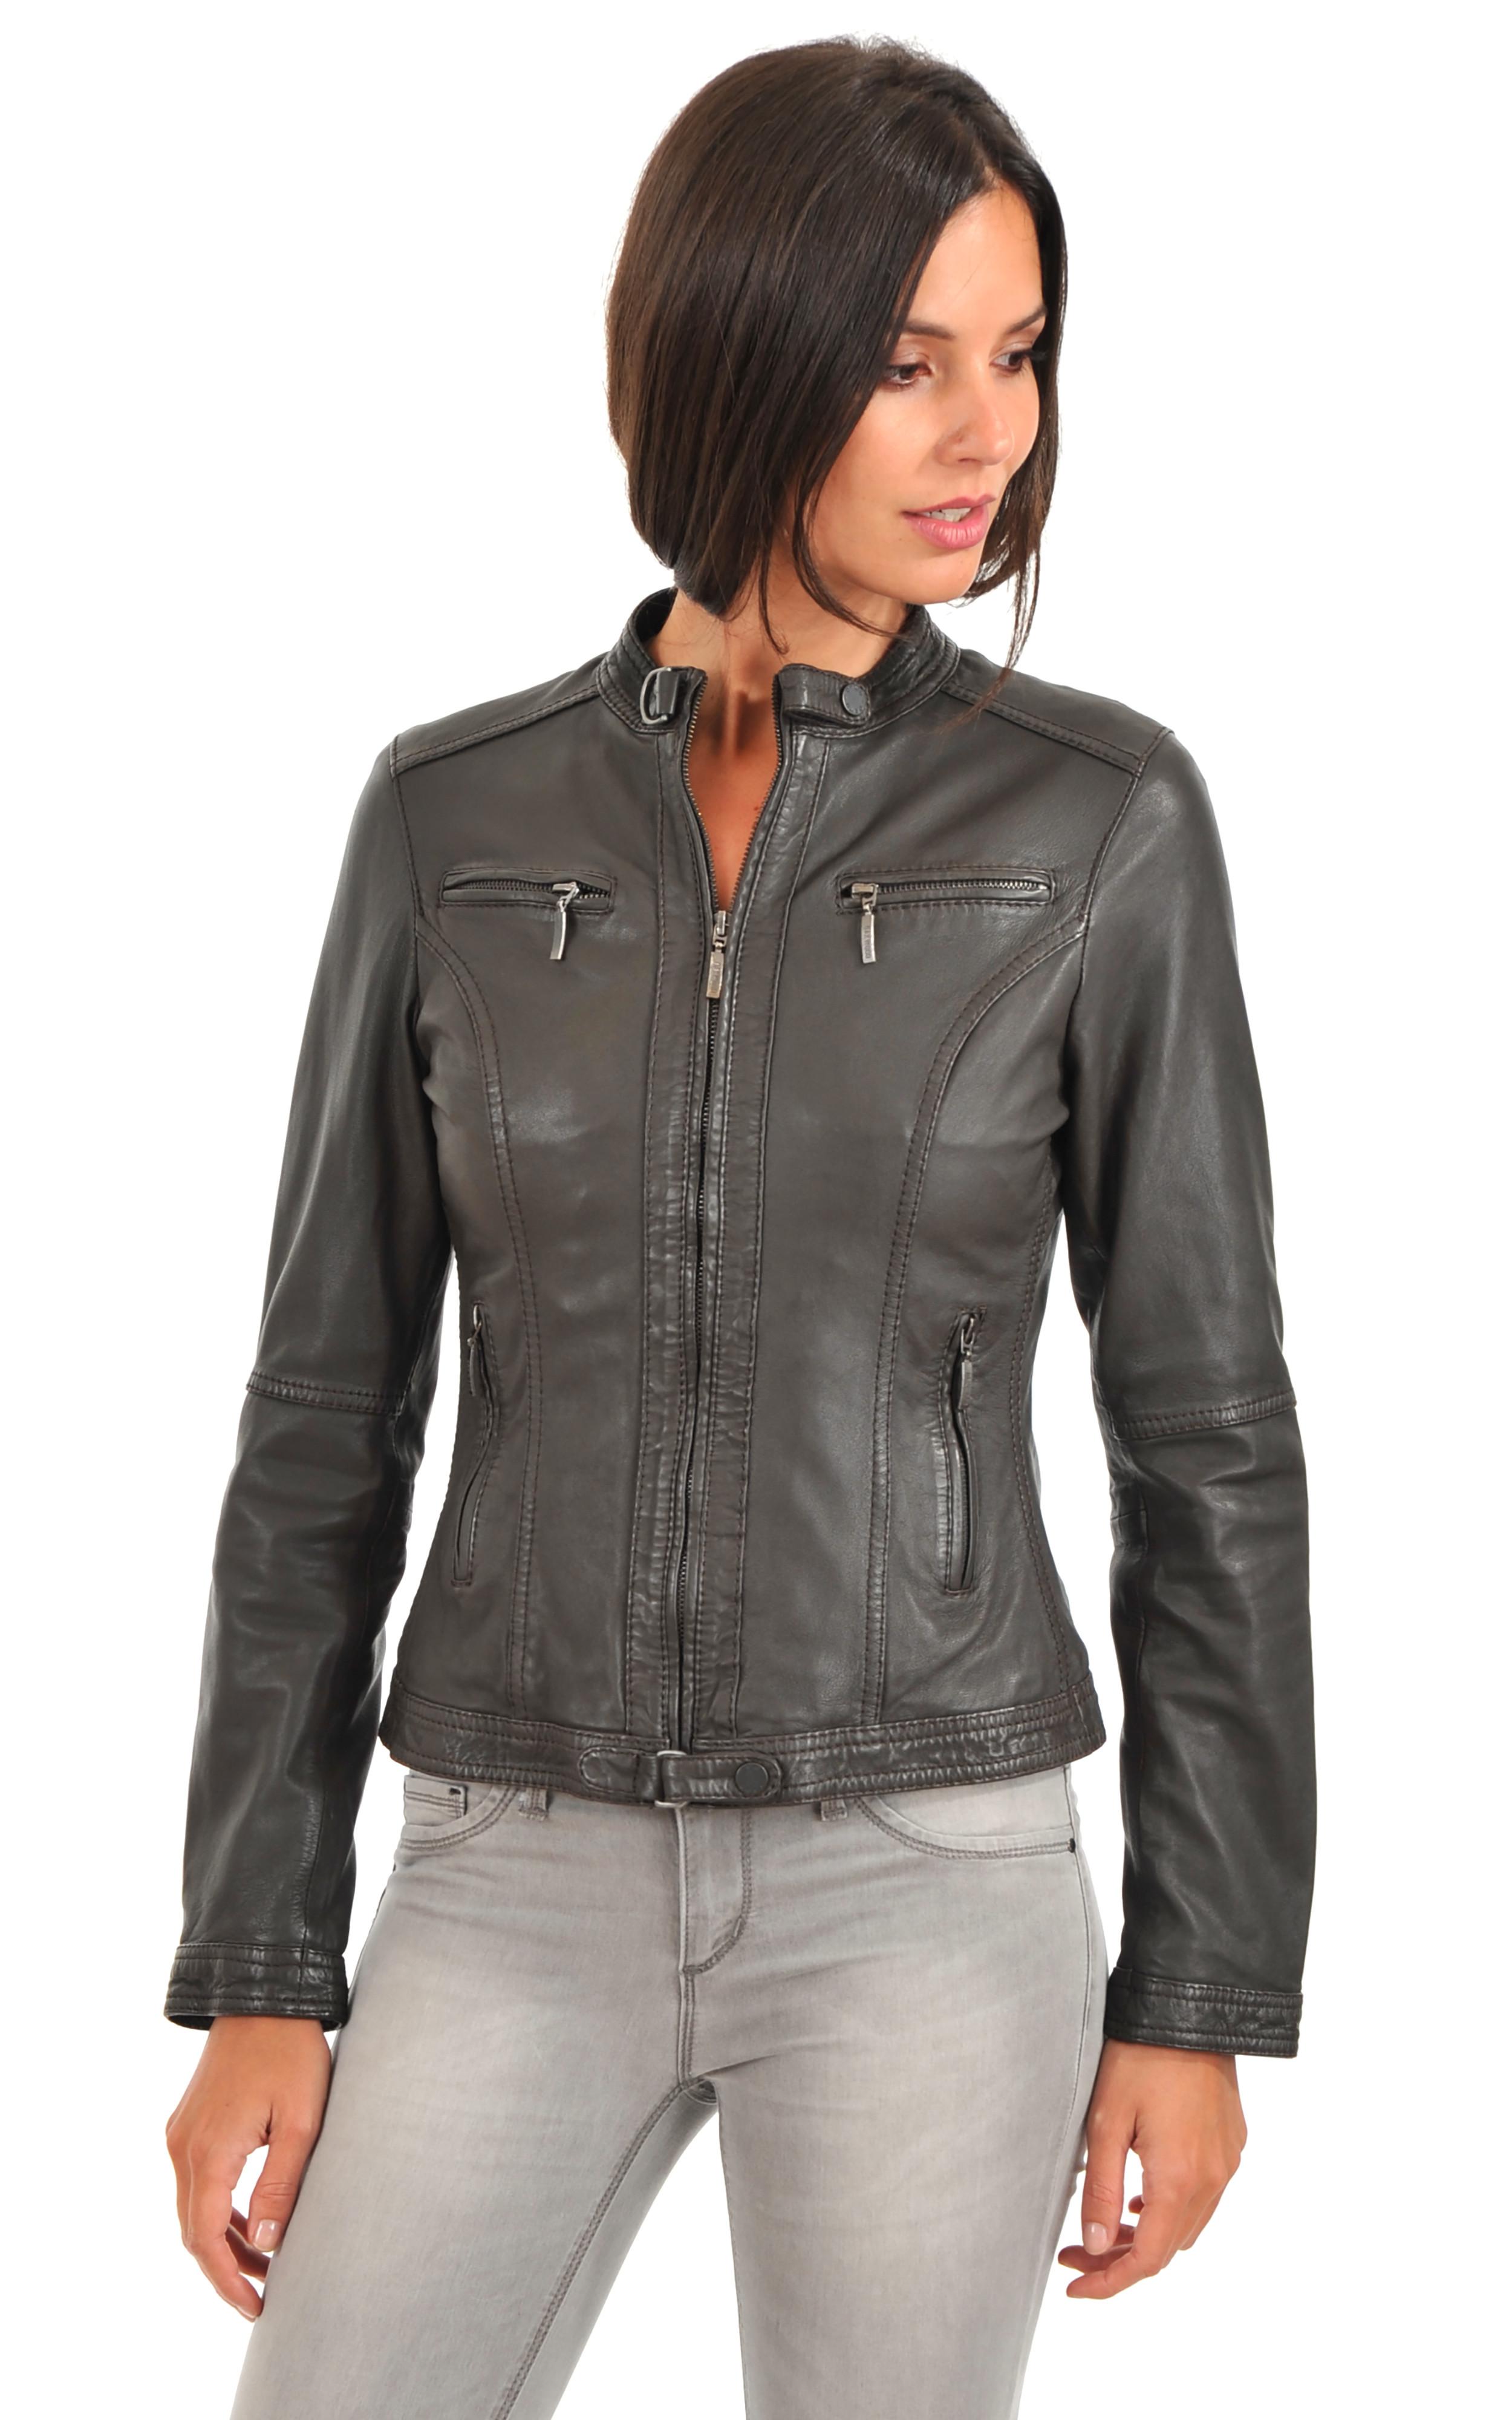 blouson motard femme oakwood la canadienne blouson cuir marron. Black Bedroom Furniture Sets. Home Design Ideas